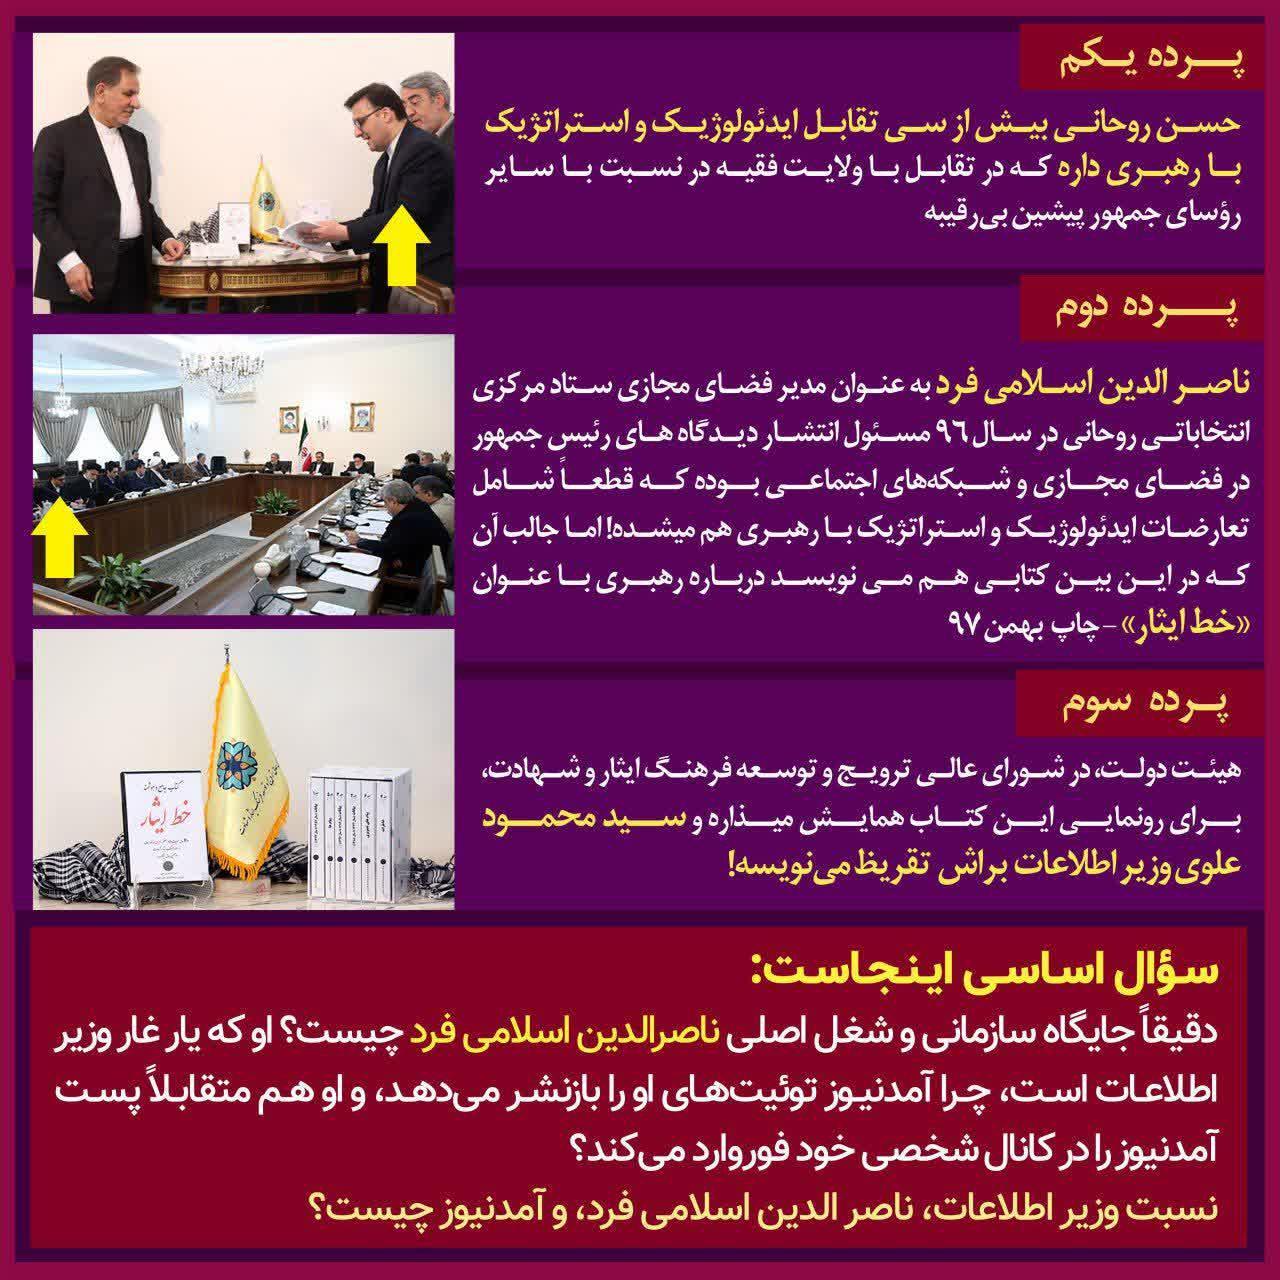 http://dl-abbasi.ir/yekta/1398/Graphic/eslamifard/eslamifard%20(7).jpg